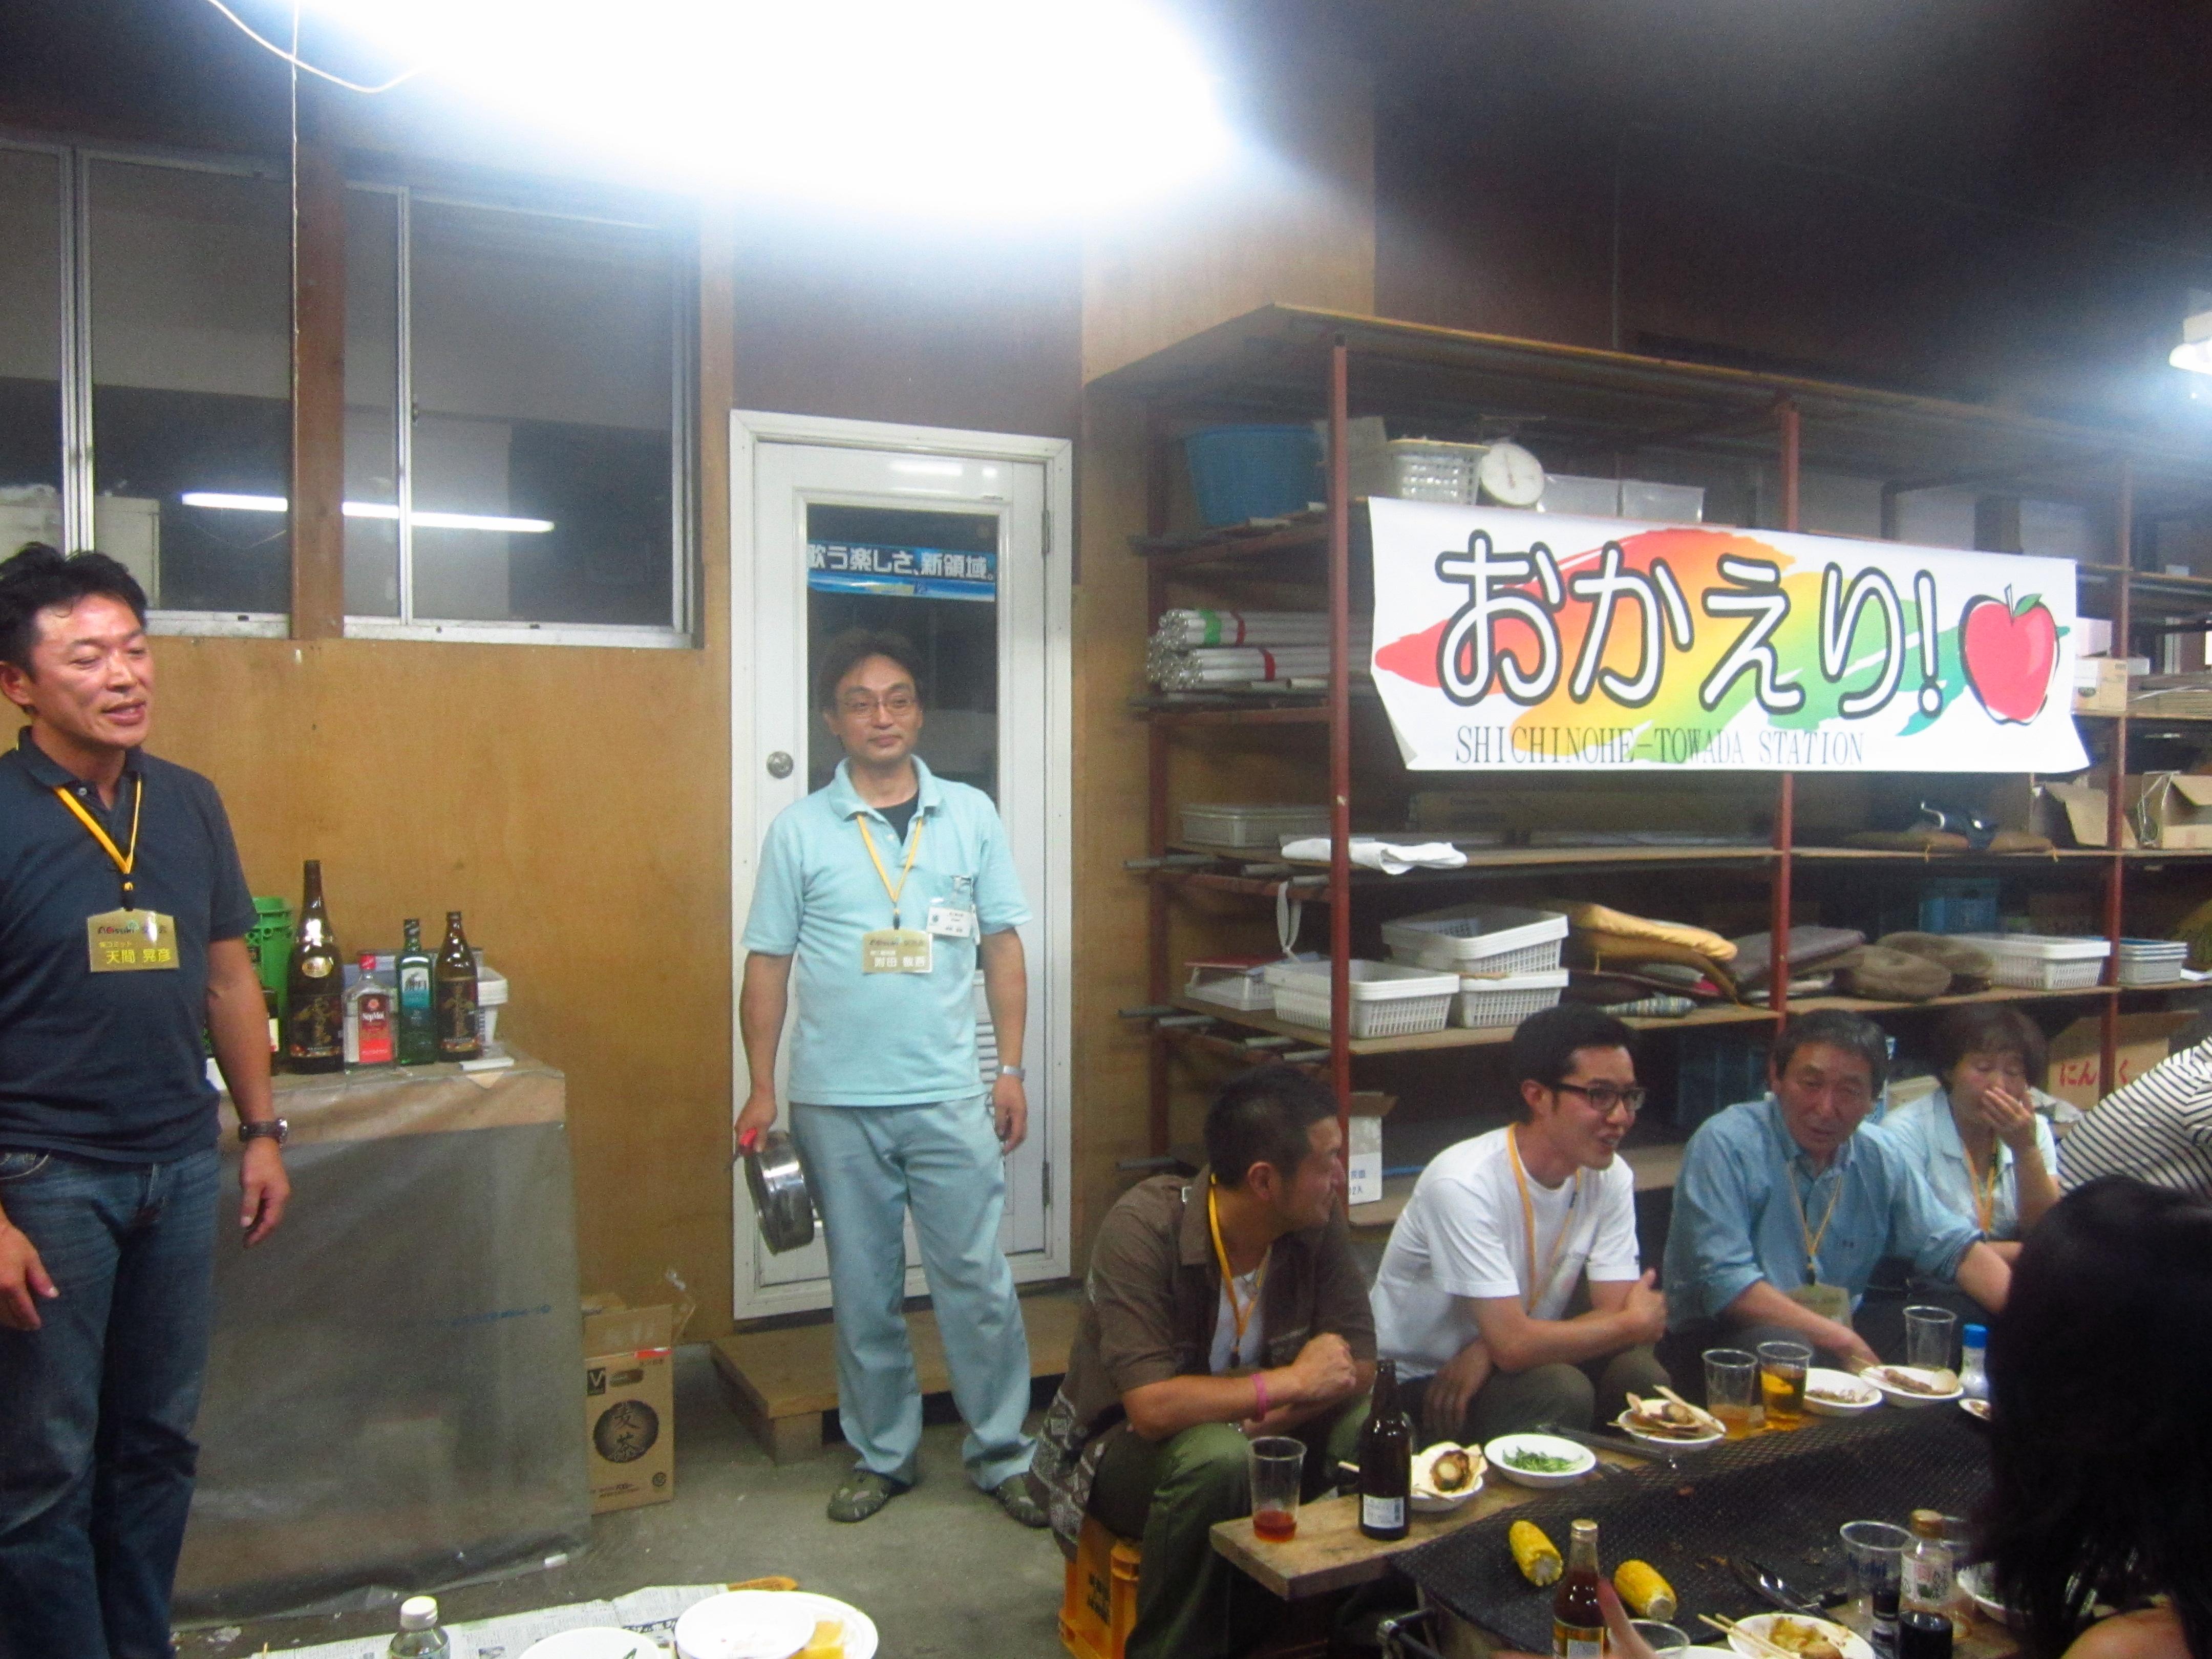 IMG 4327 - 麻布十番納涼祭り25,26日(七戸町出店)